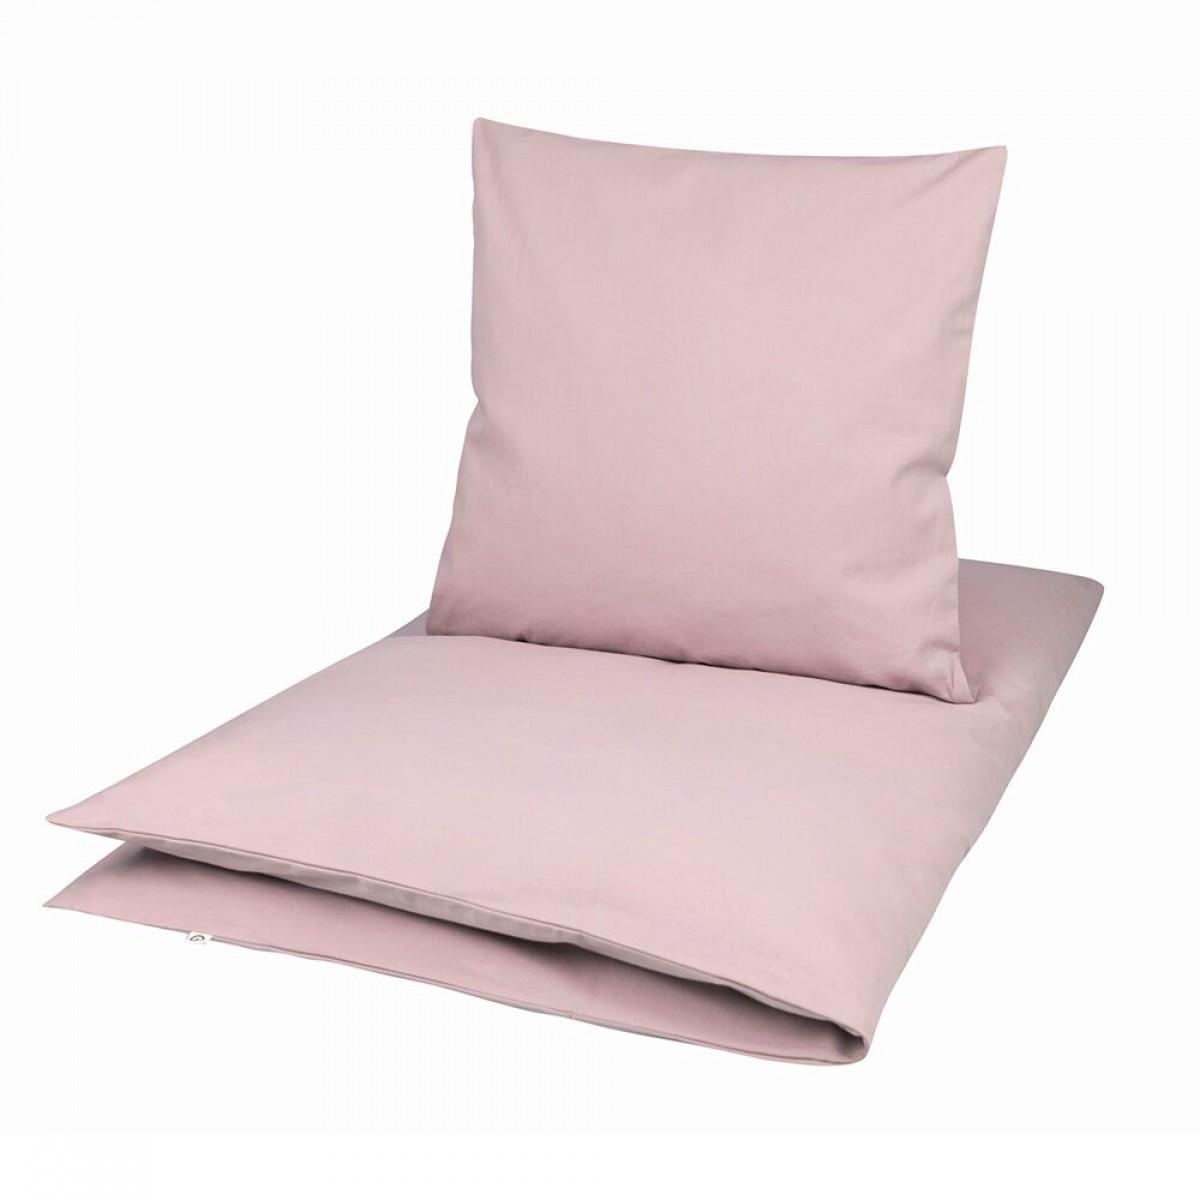 Mãœsli Müsli babysengetøj - rosa, 3 stk. på lager på pixizoo